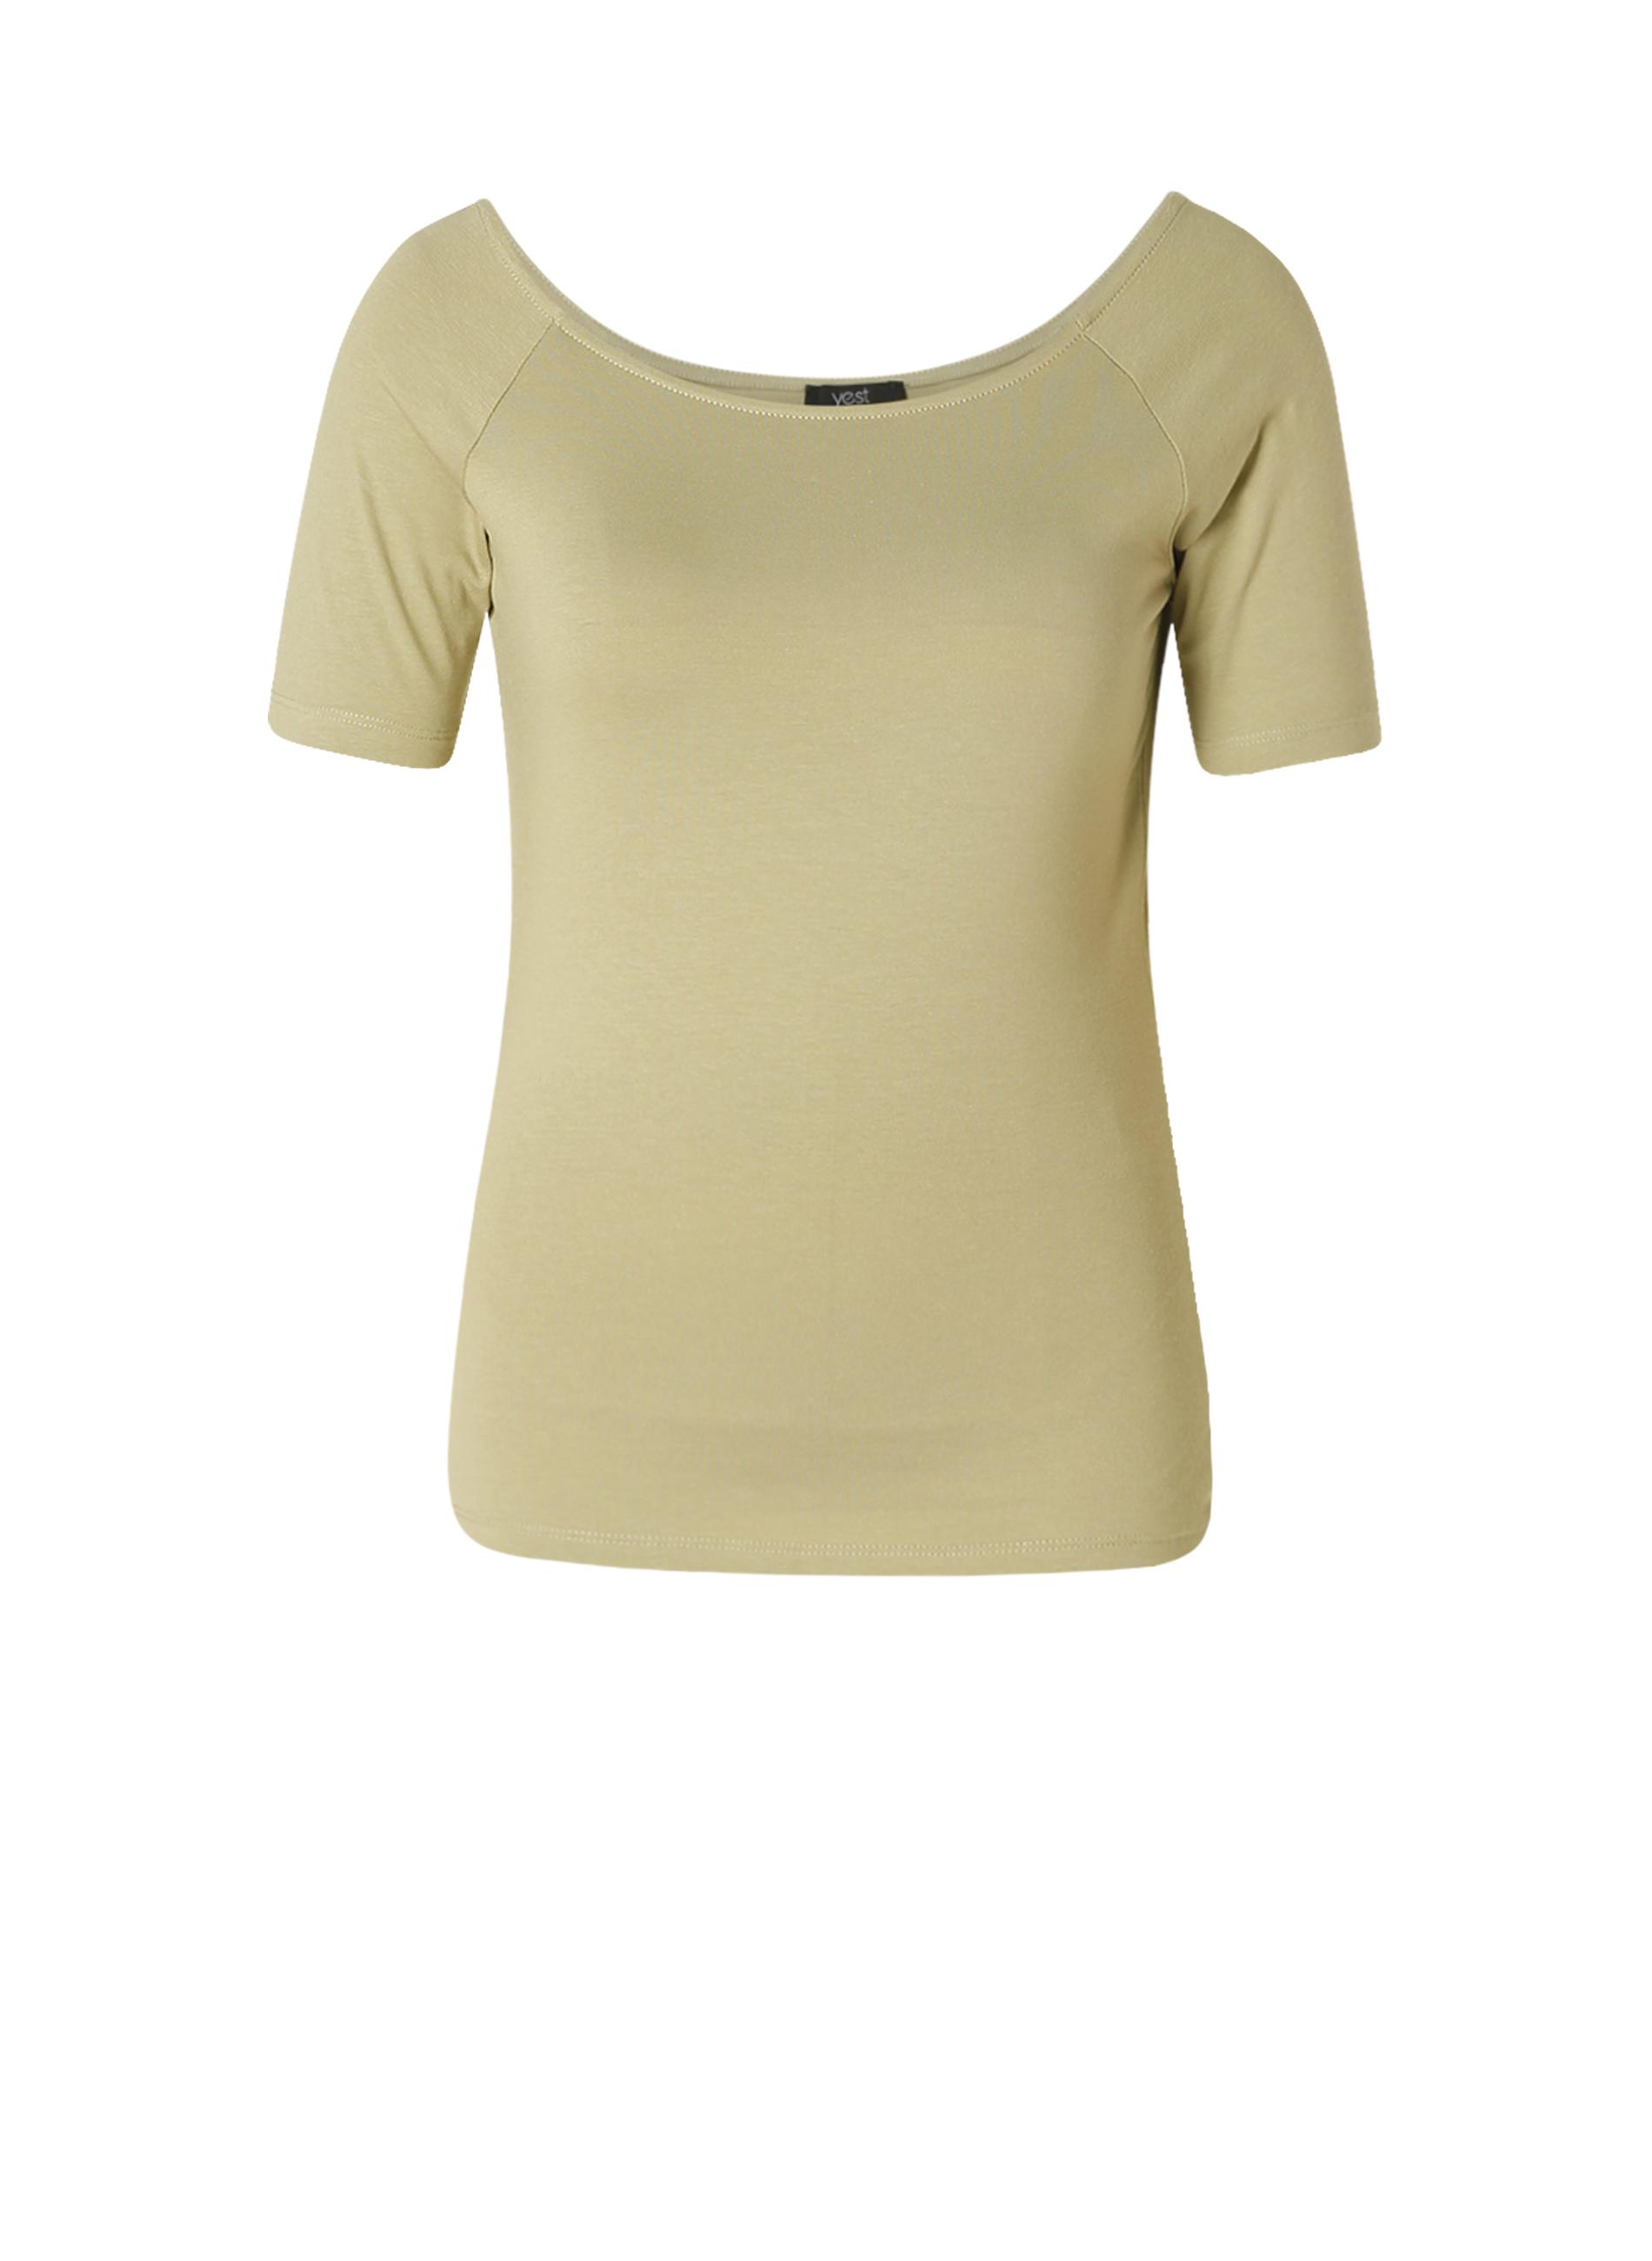 Yest shirt Ishani 60 cm